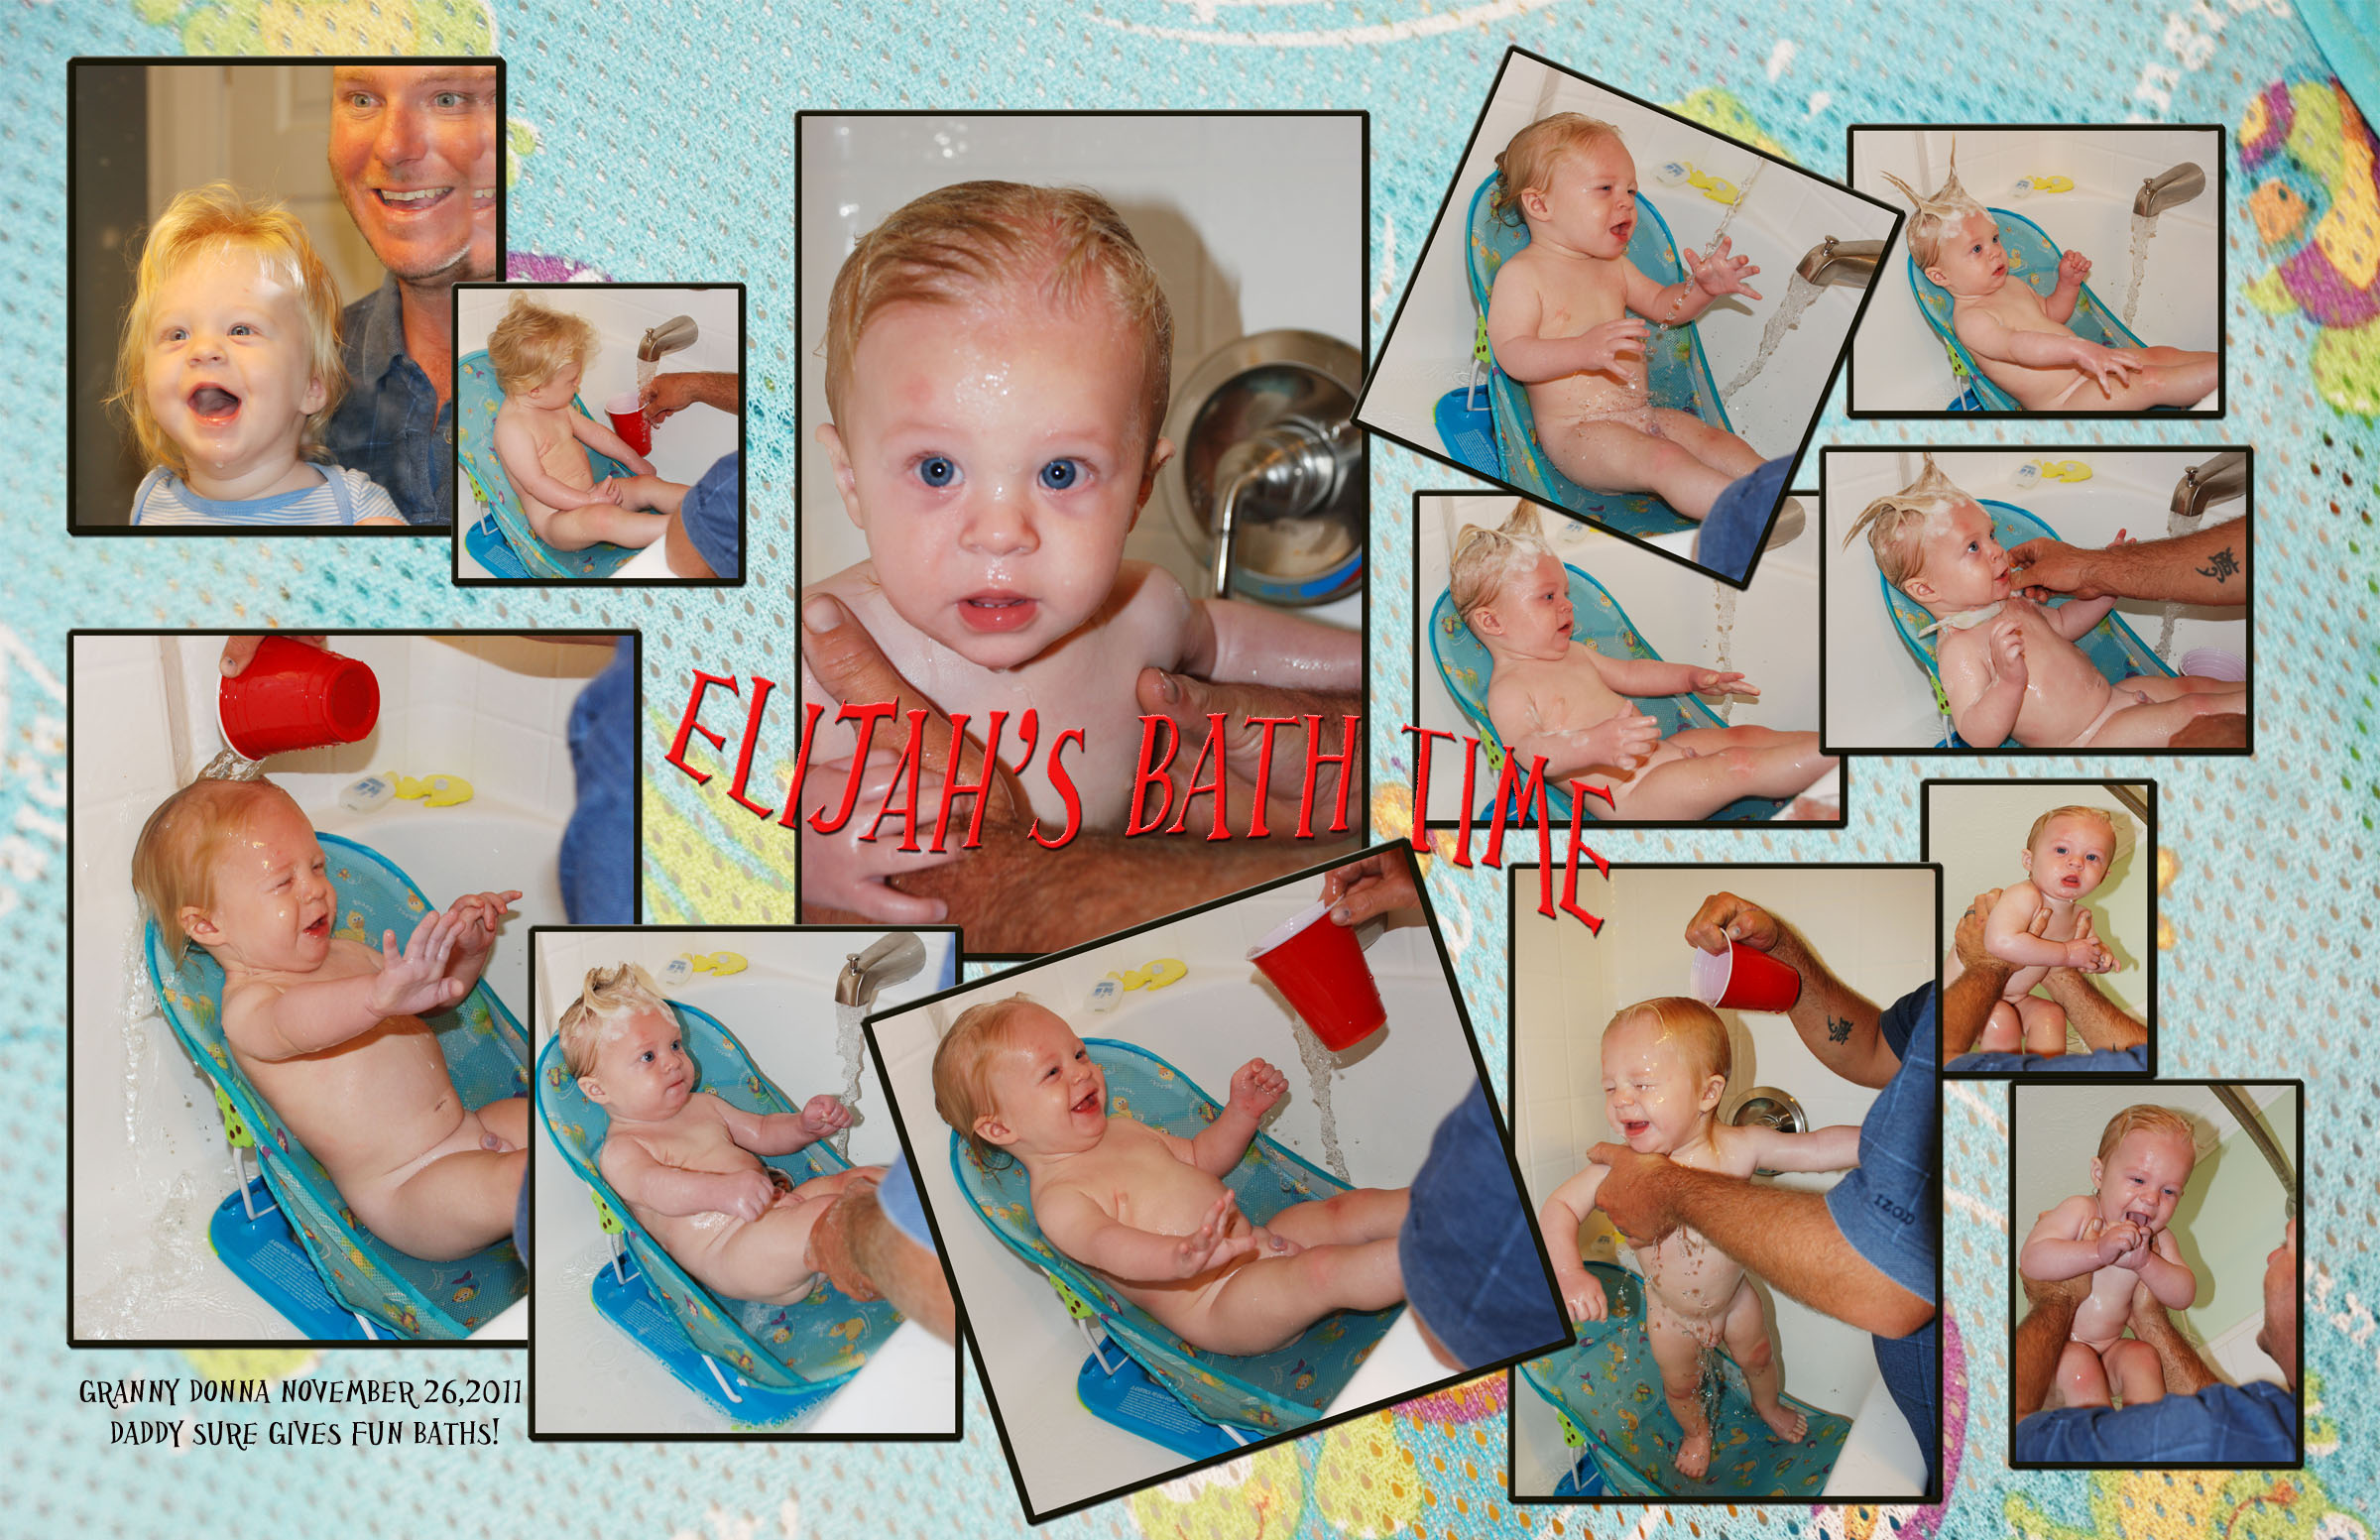 Eli's Bathtime